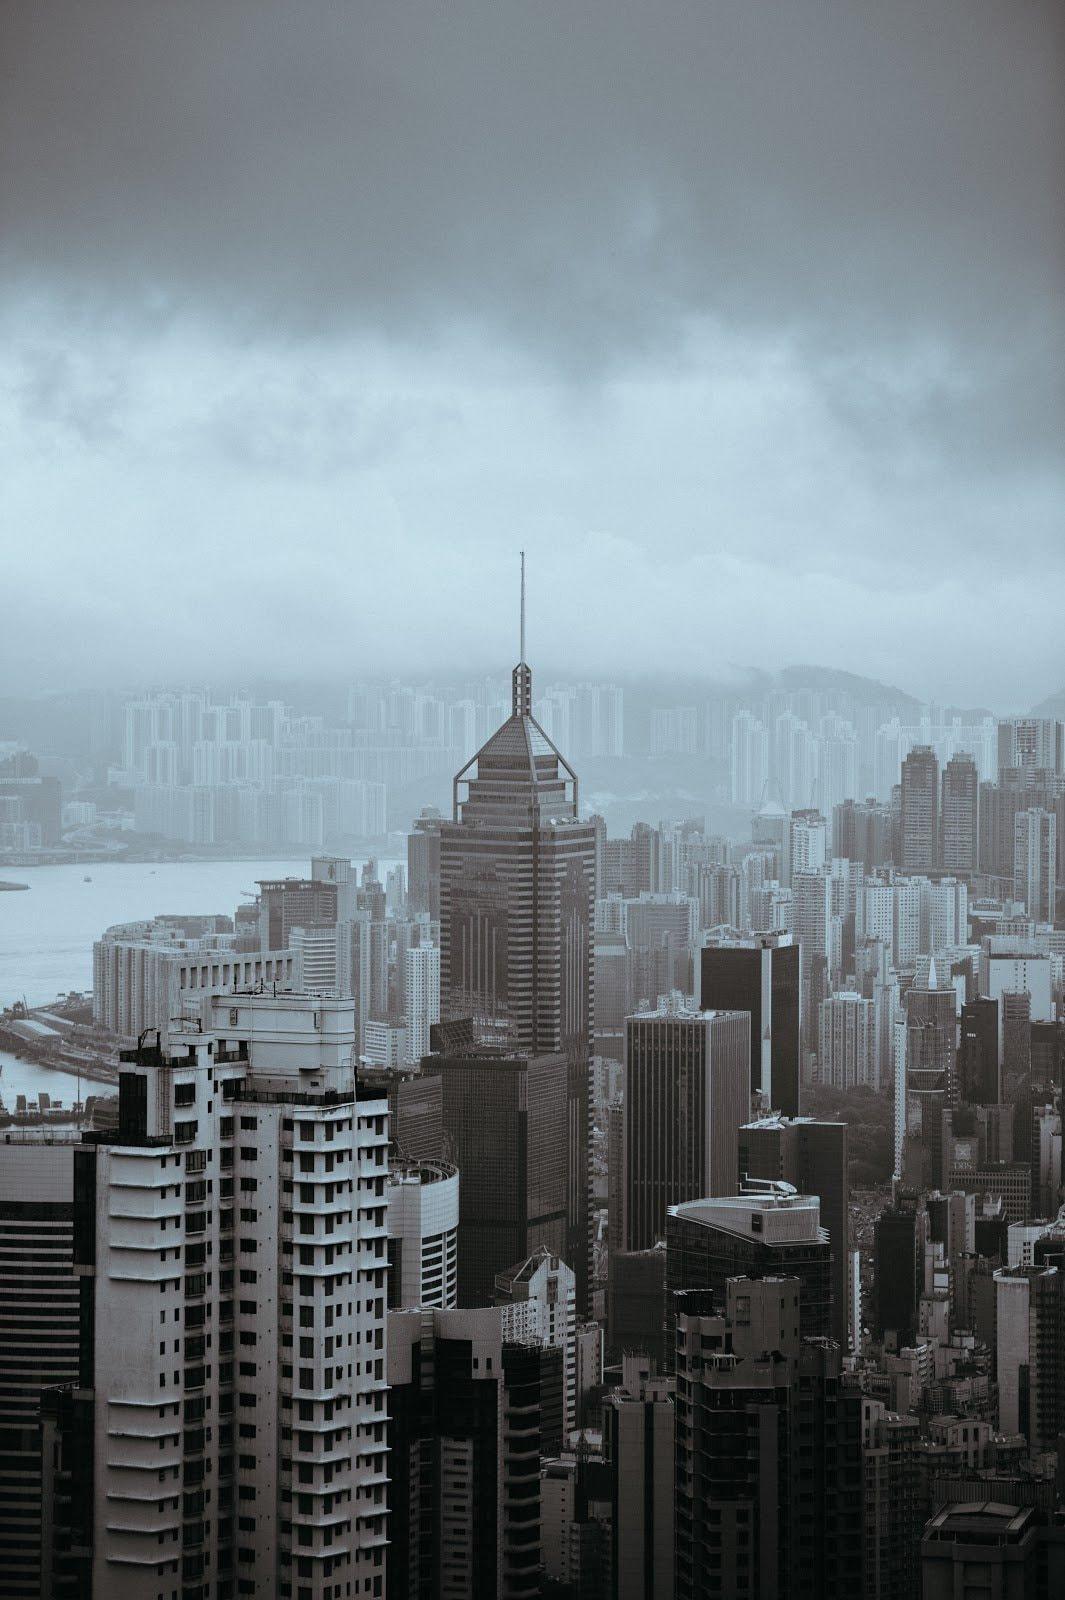 cityscape-photography-annie-spratt